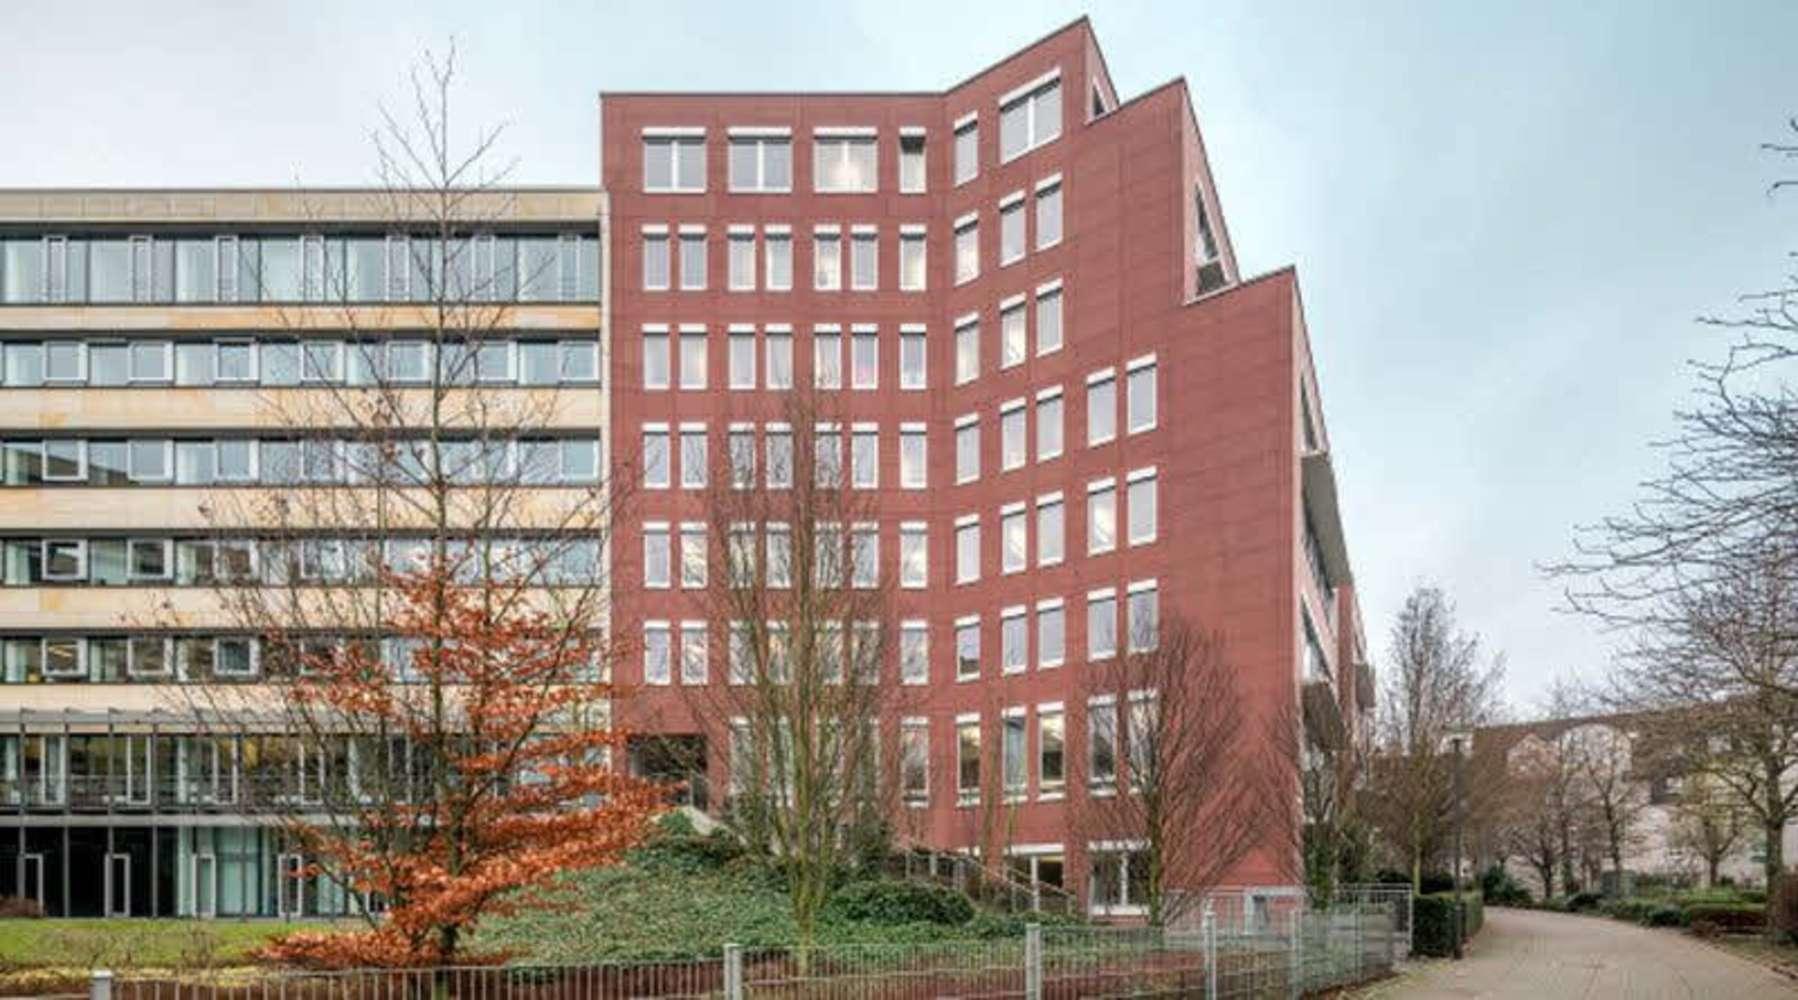 Büros Frankfurt am main, 60598 - Büro - Frankfurt am Main, Sachsenhausen - F2166 - 9418111